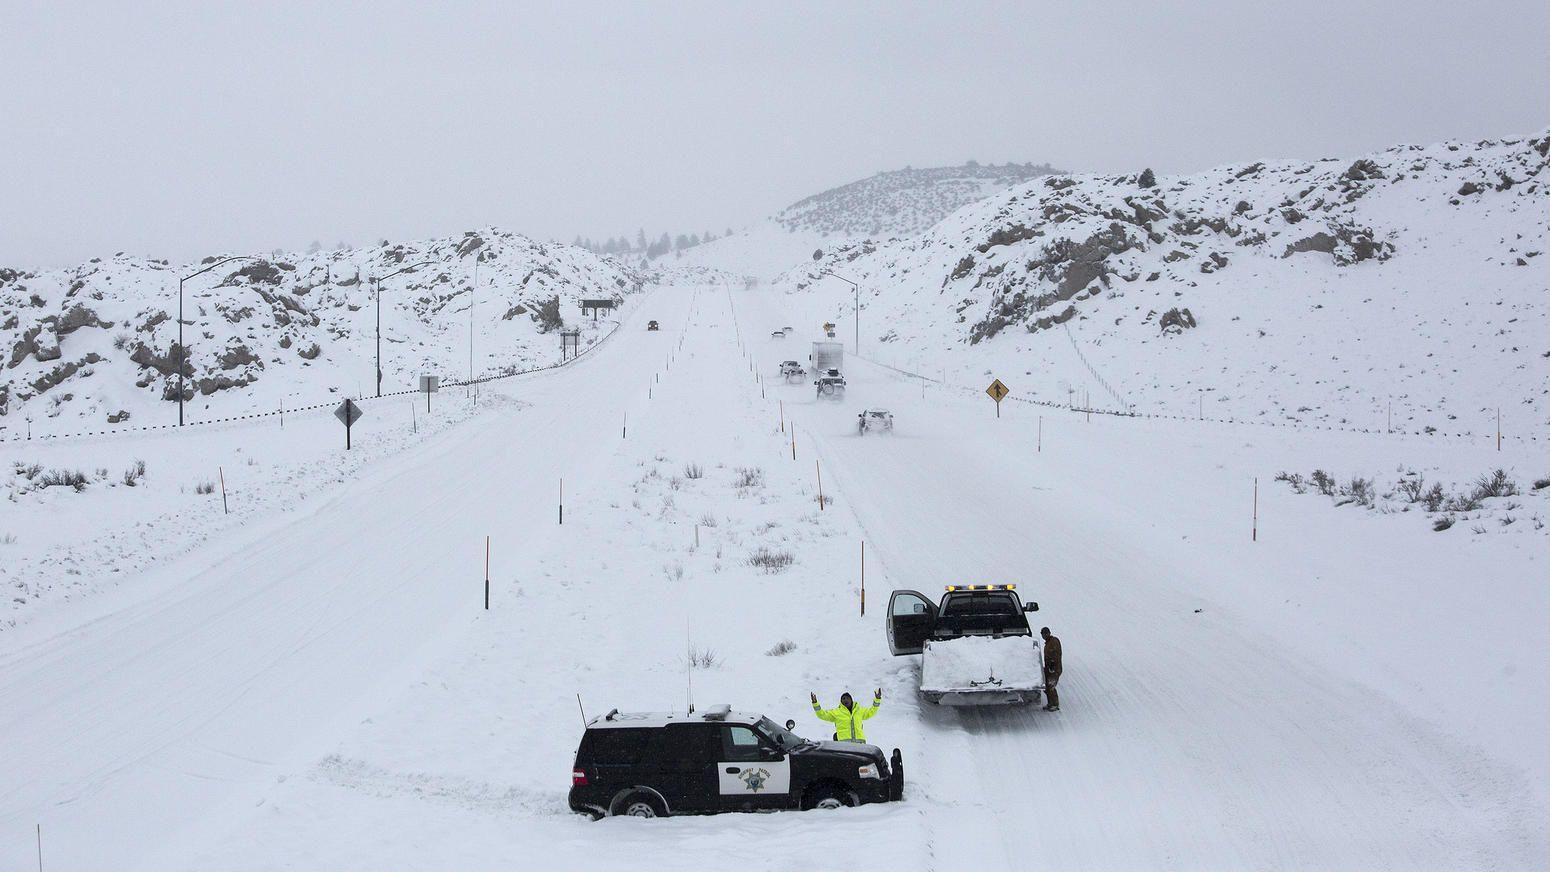 Storm system moves in California highway patrol, Sierra